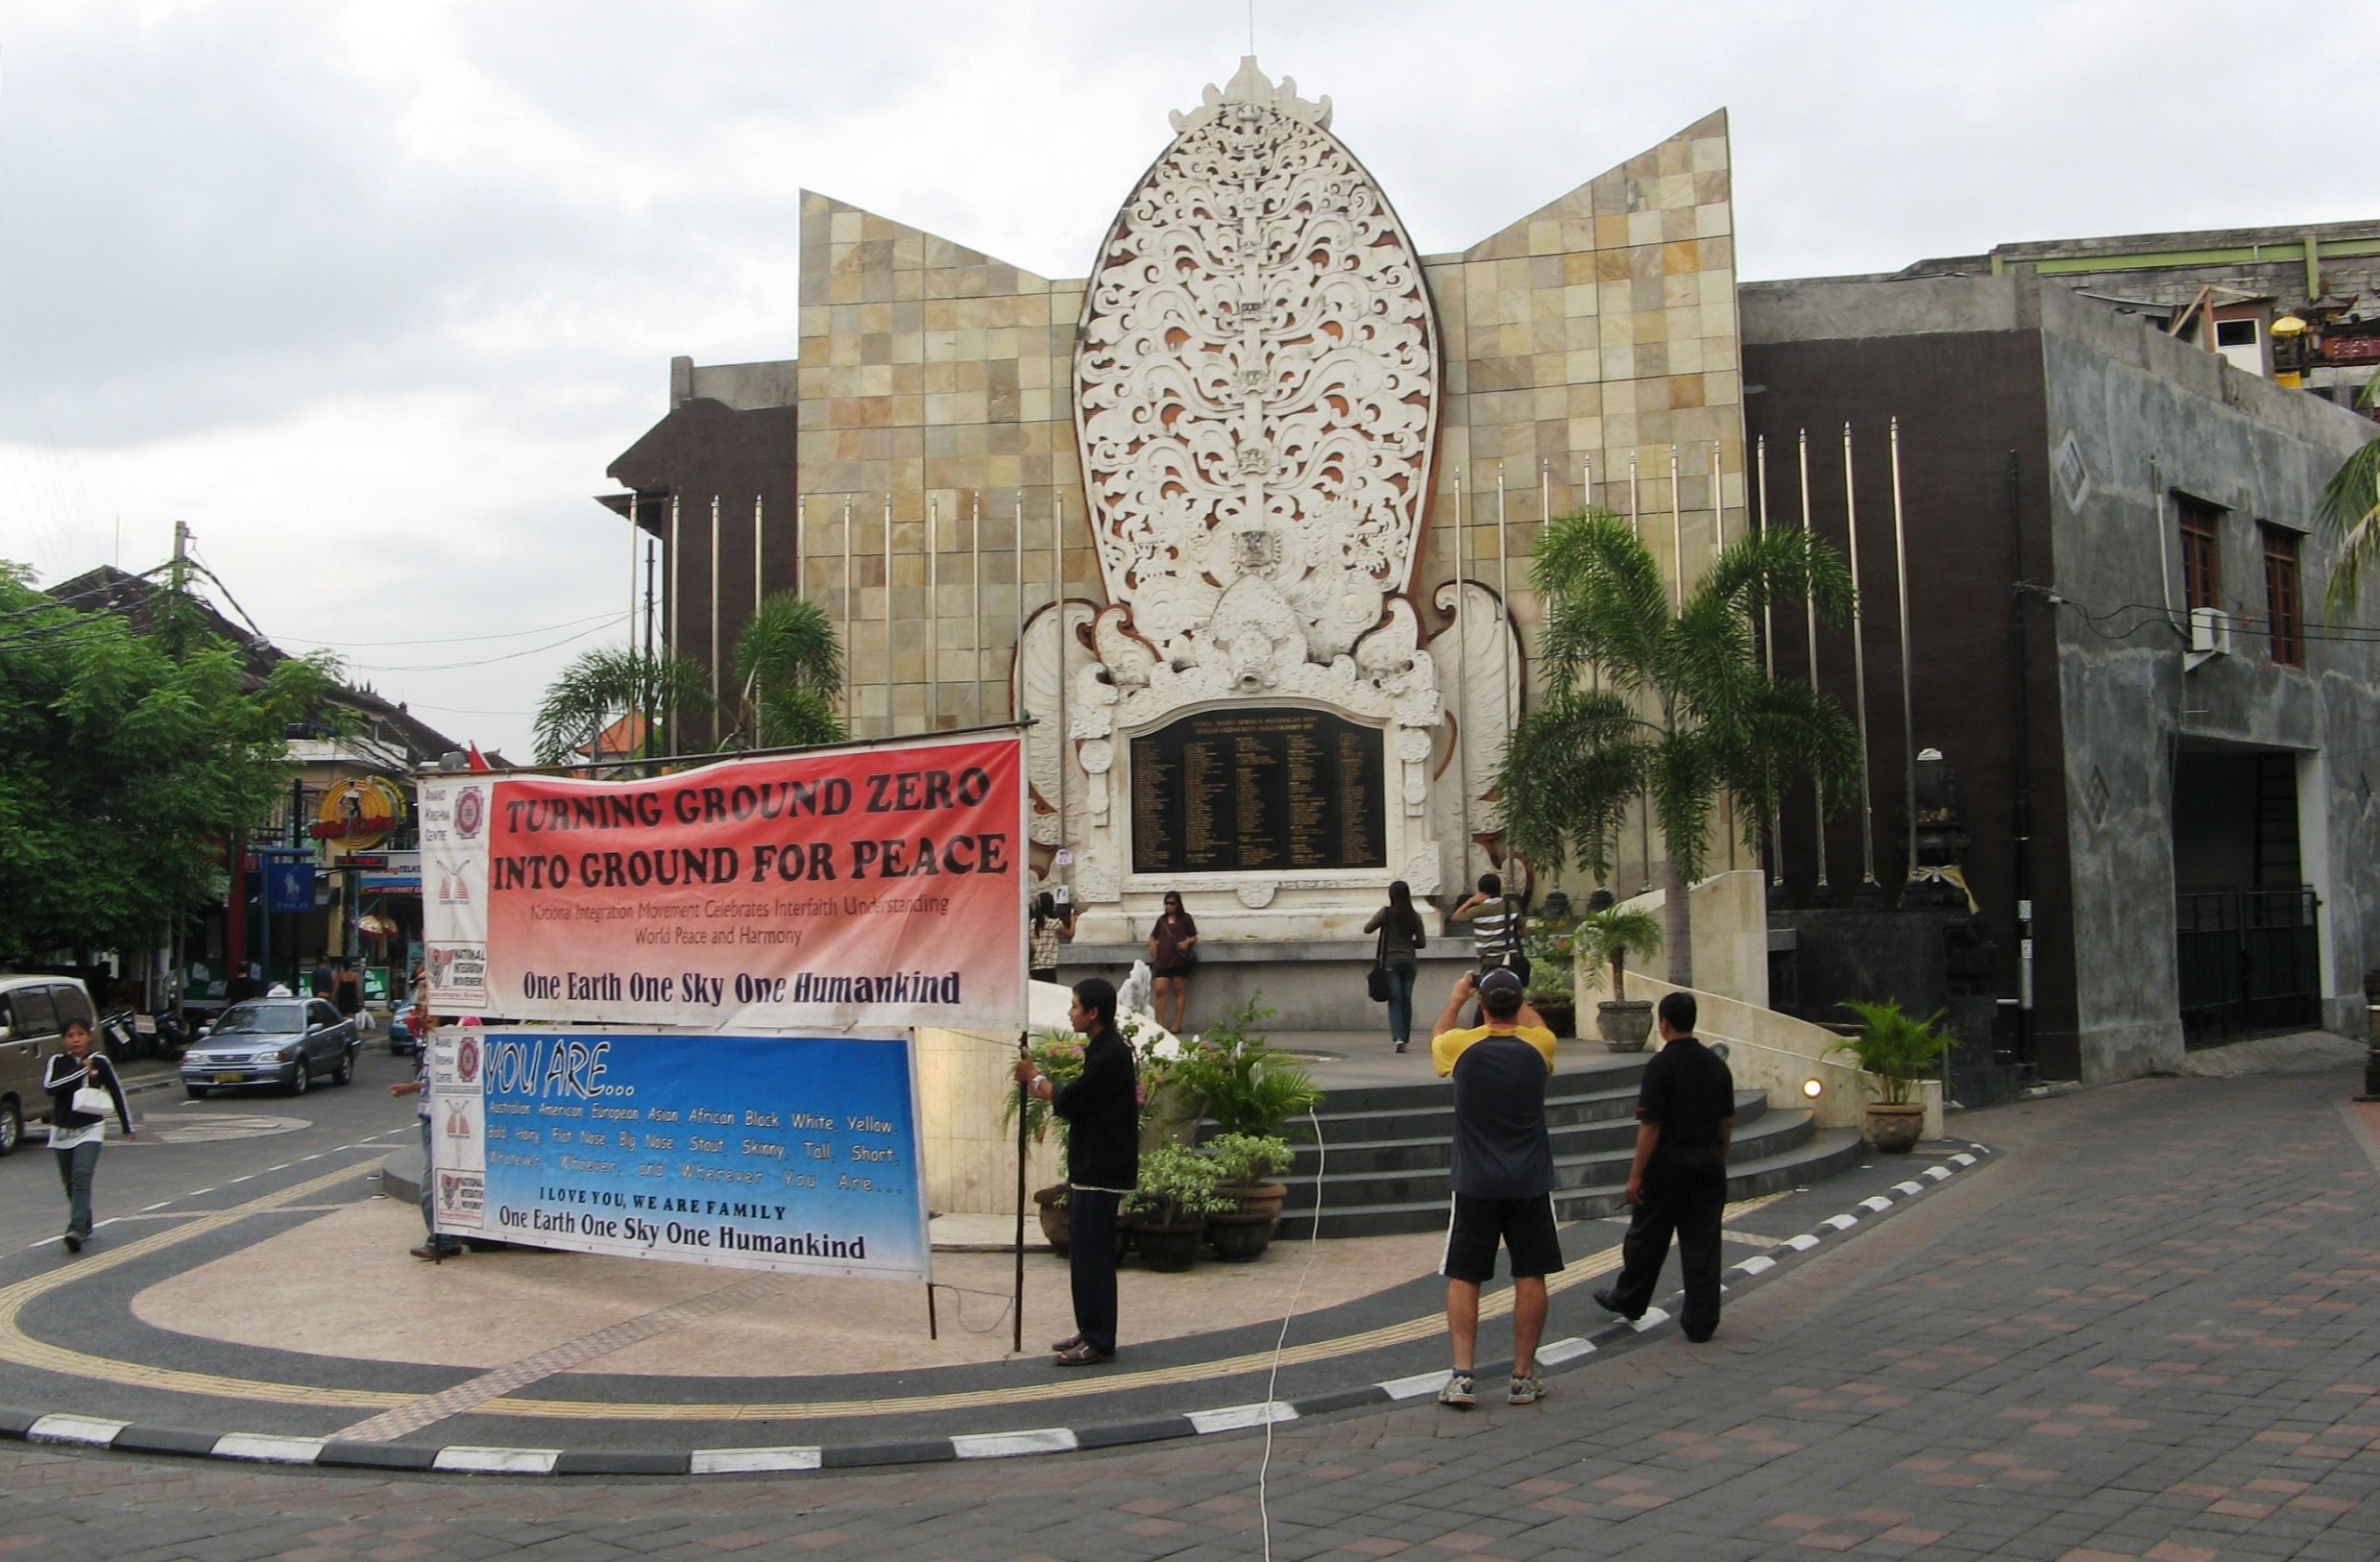 Memorial site on Bali Ground Zero